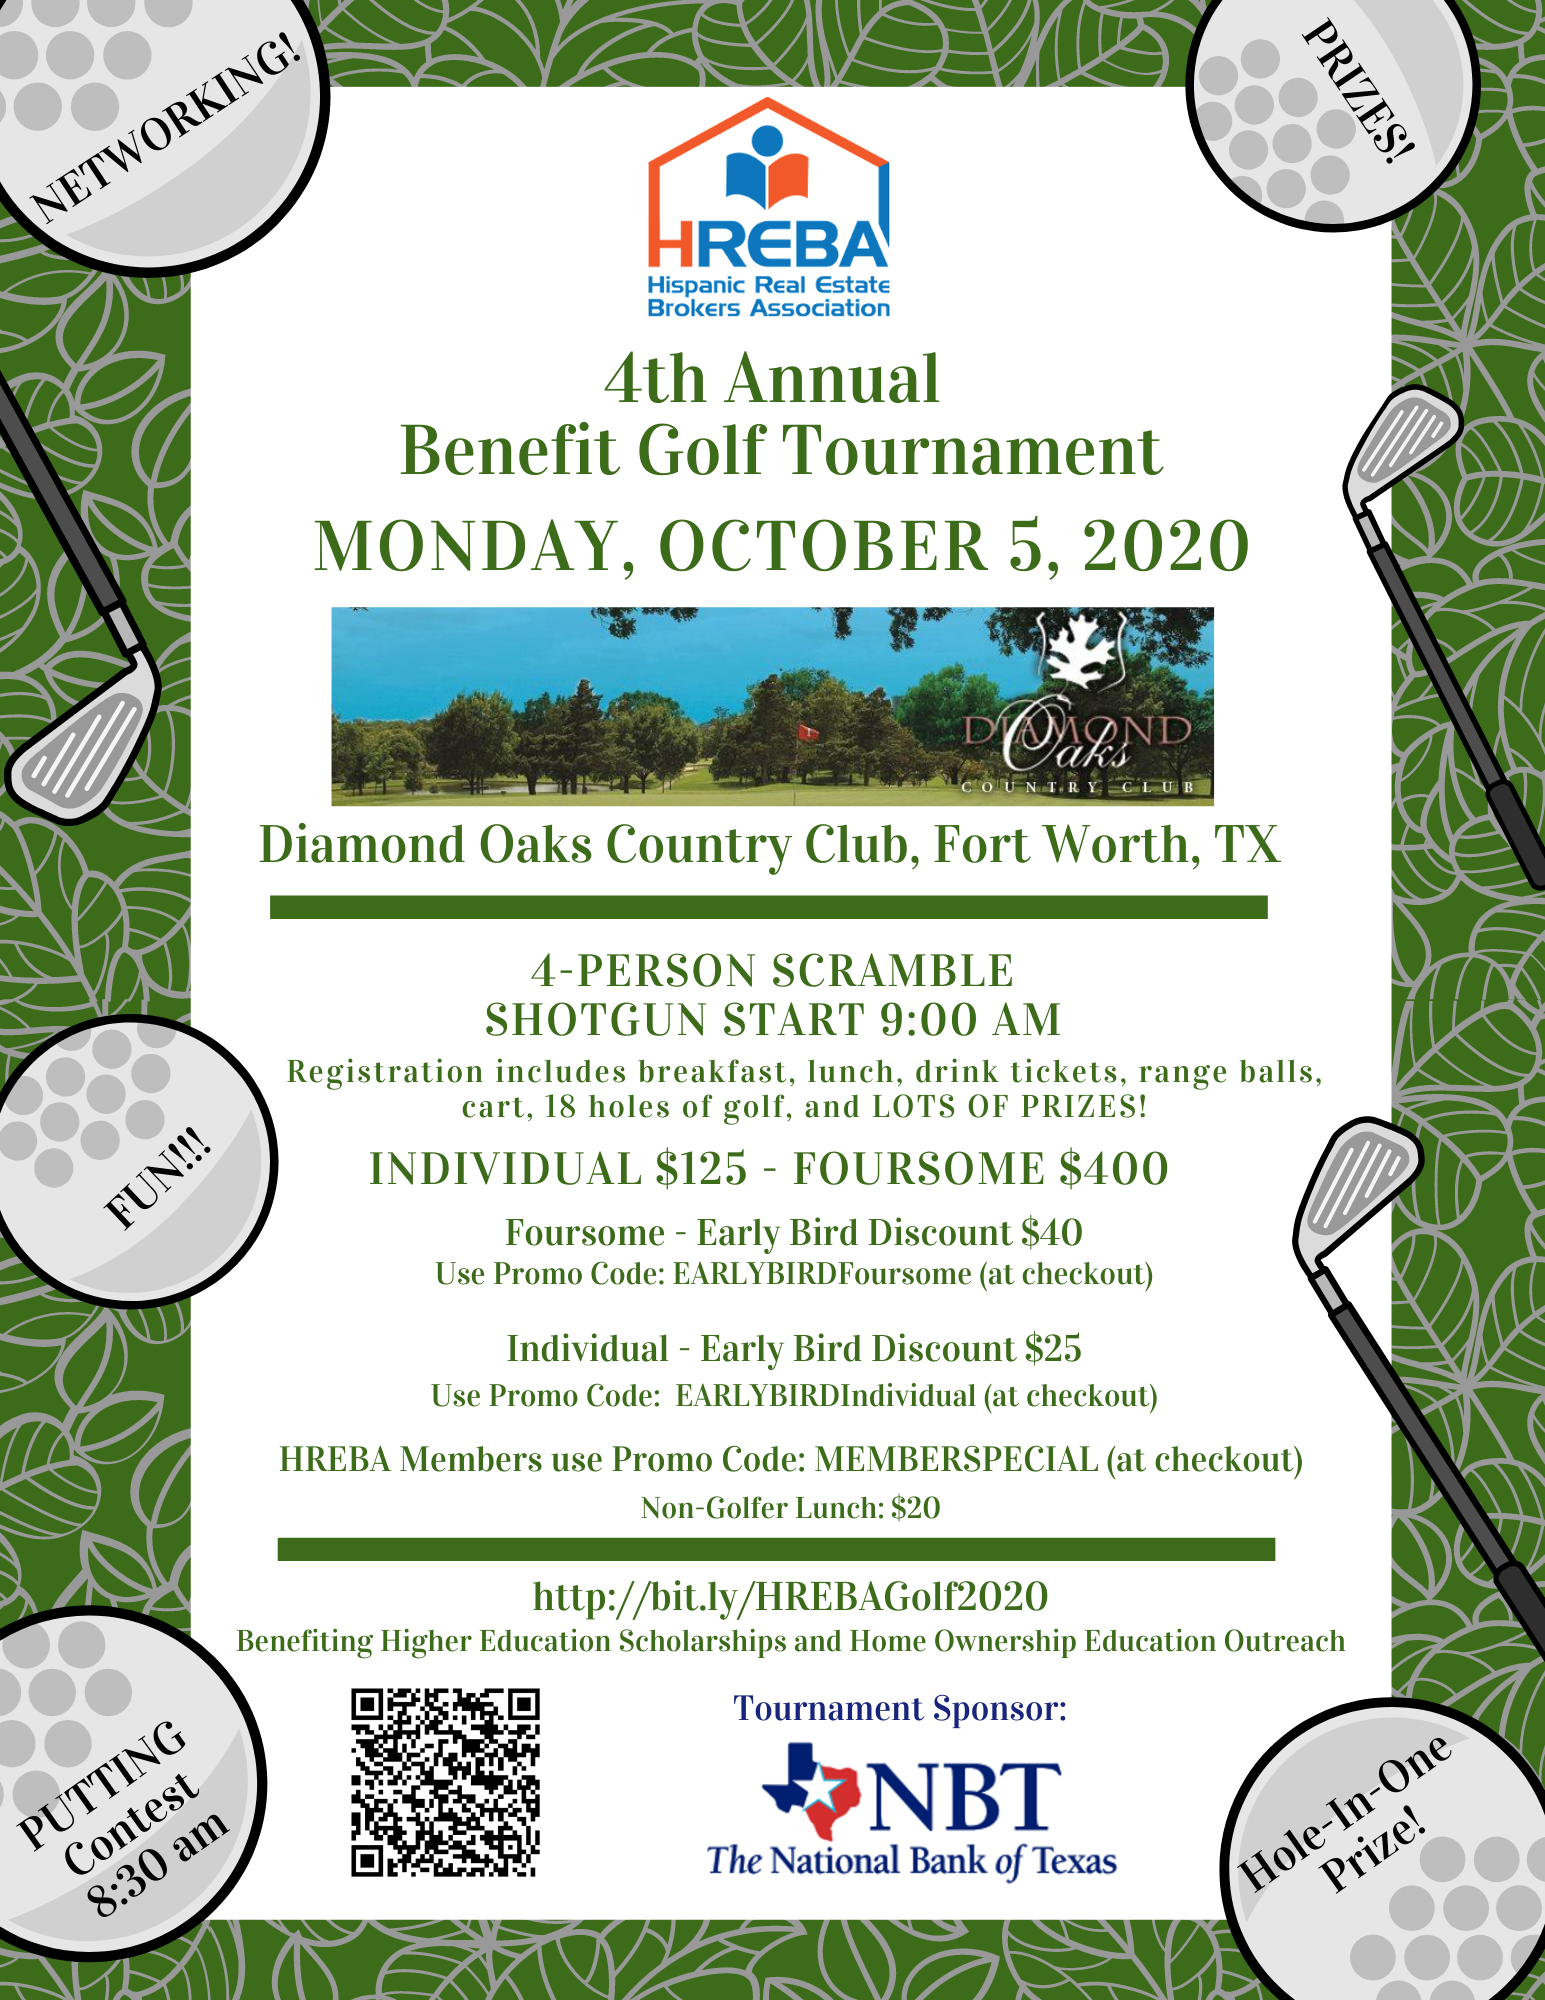 4th Annual HREBA Benefit Golf Tournament